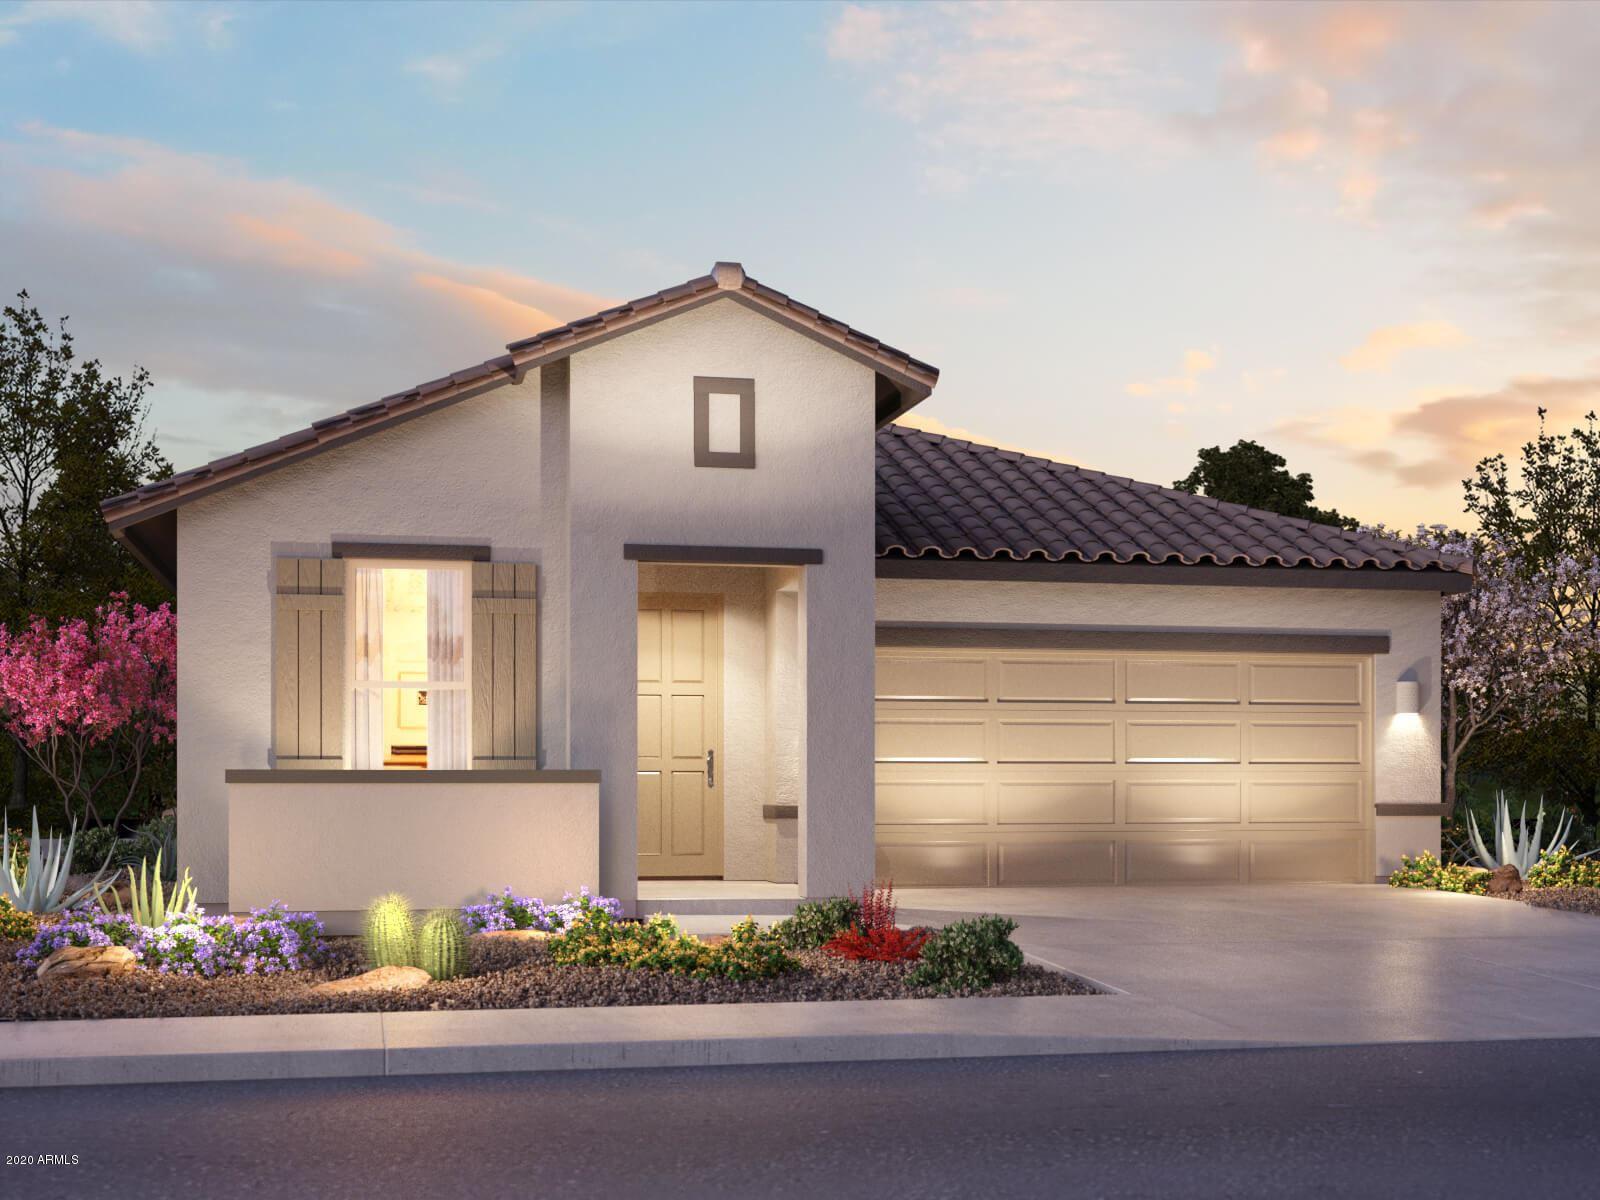 21078 N EVERGREEN Drive, Maricopa, AZ 85138 - MLS#: 6110396